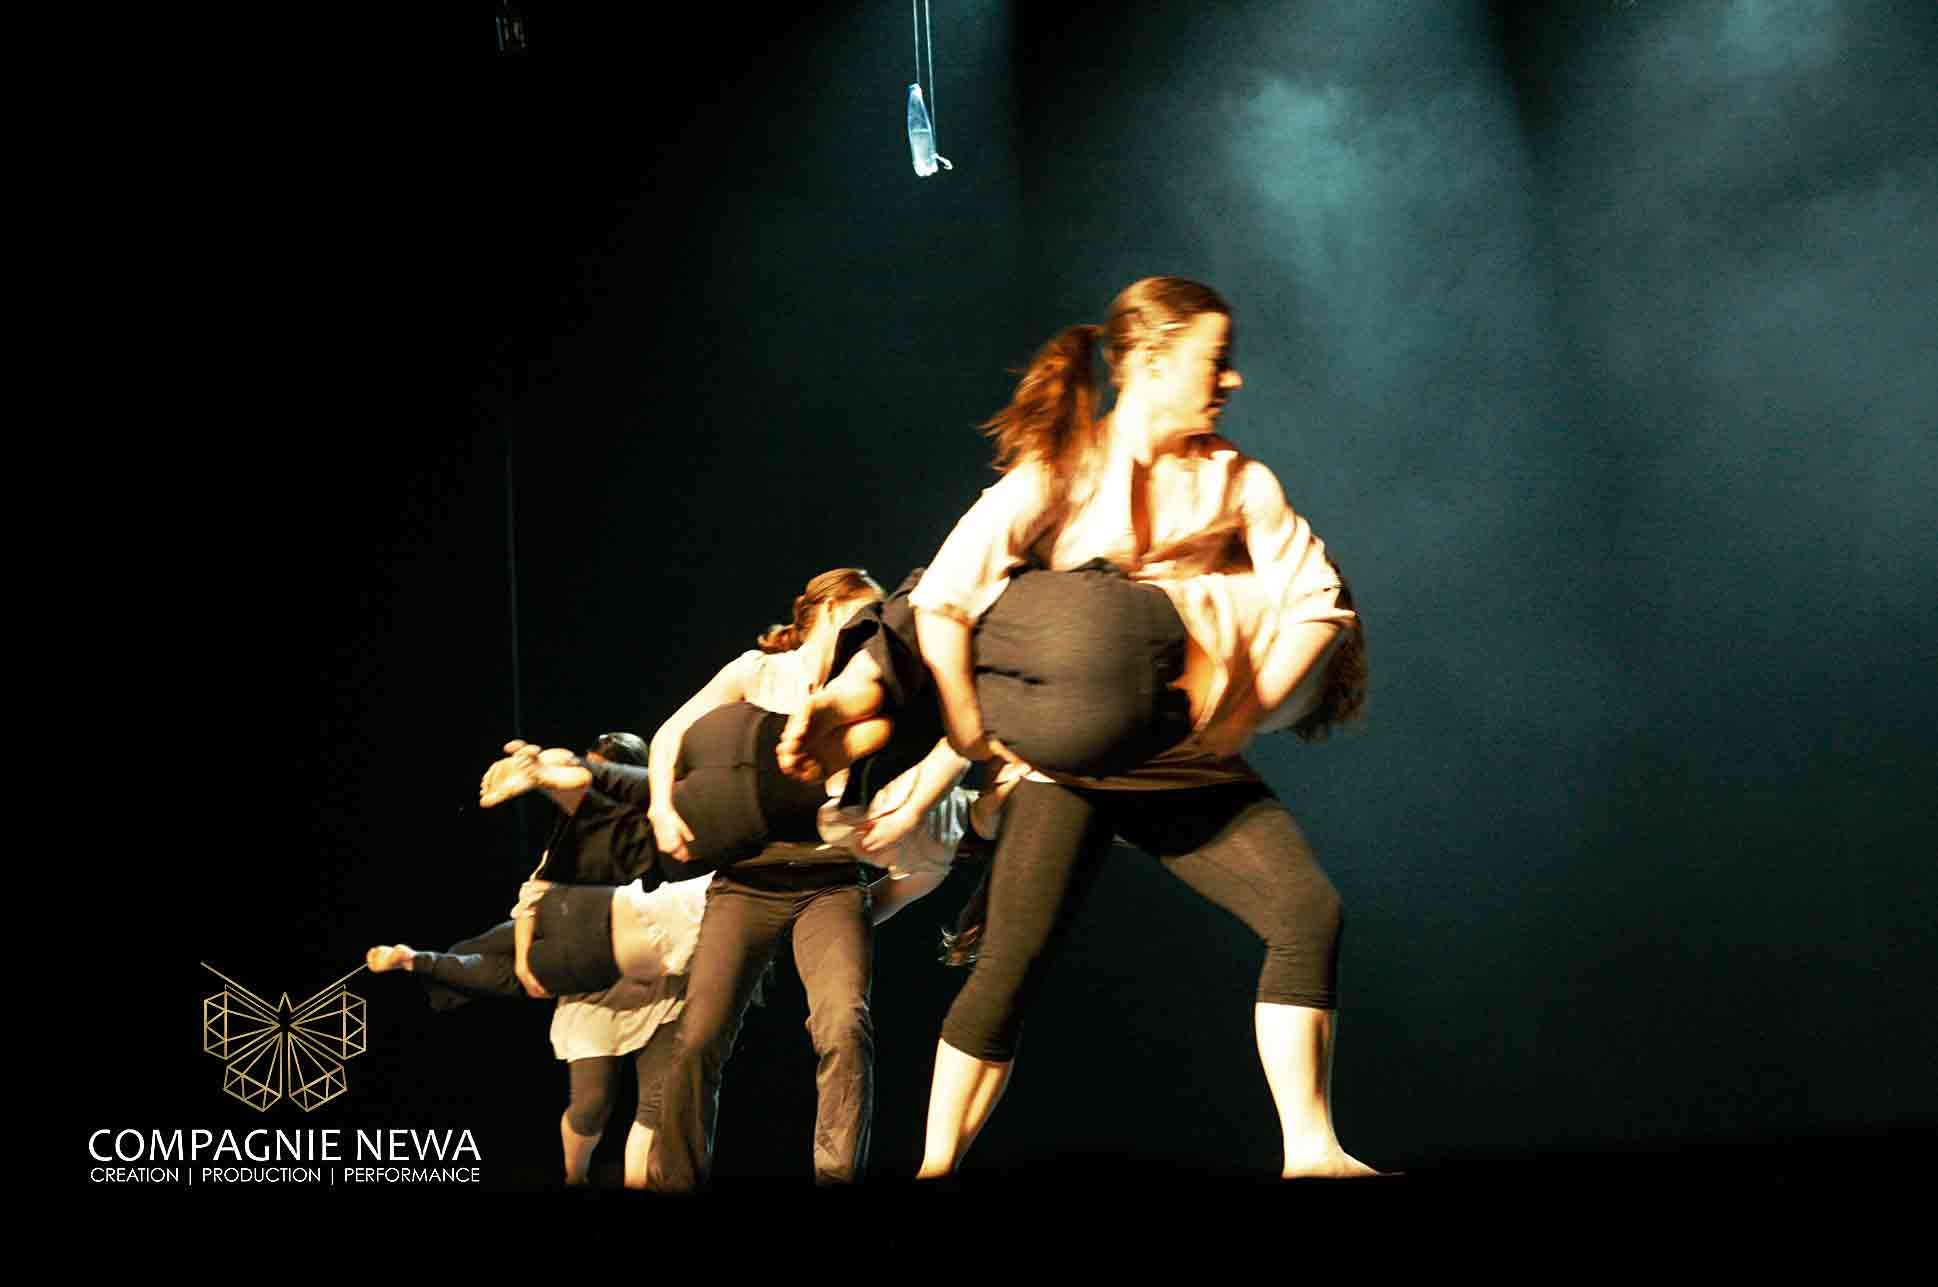 Compagnie_NEWA_blank_concepten_dans_performance